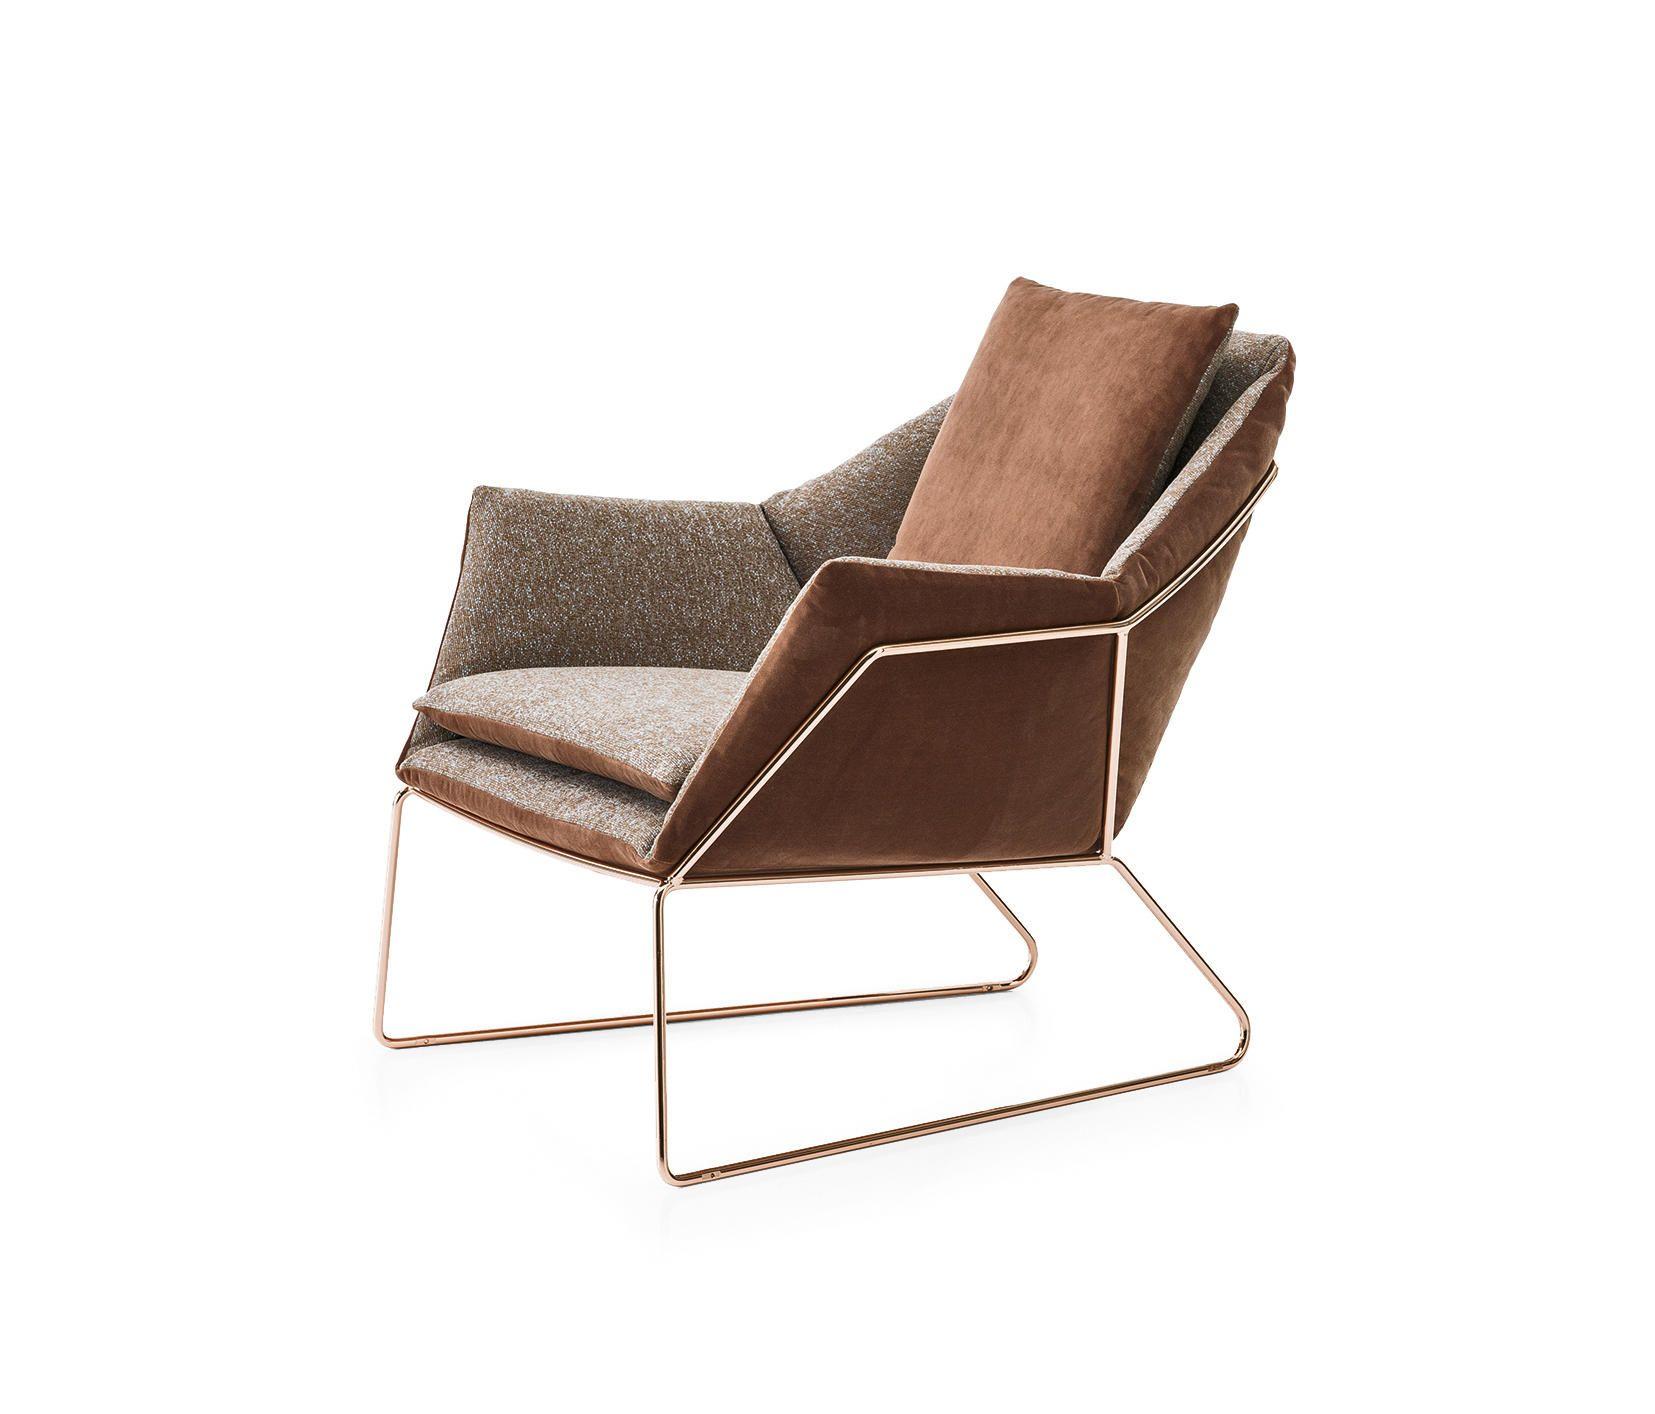 New York Armchair By Saba Italia Lounge Chairs Furniture Design Chair Lounge Armchair Armchair Design